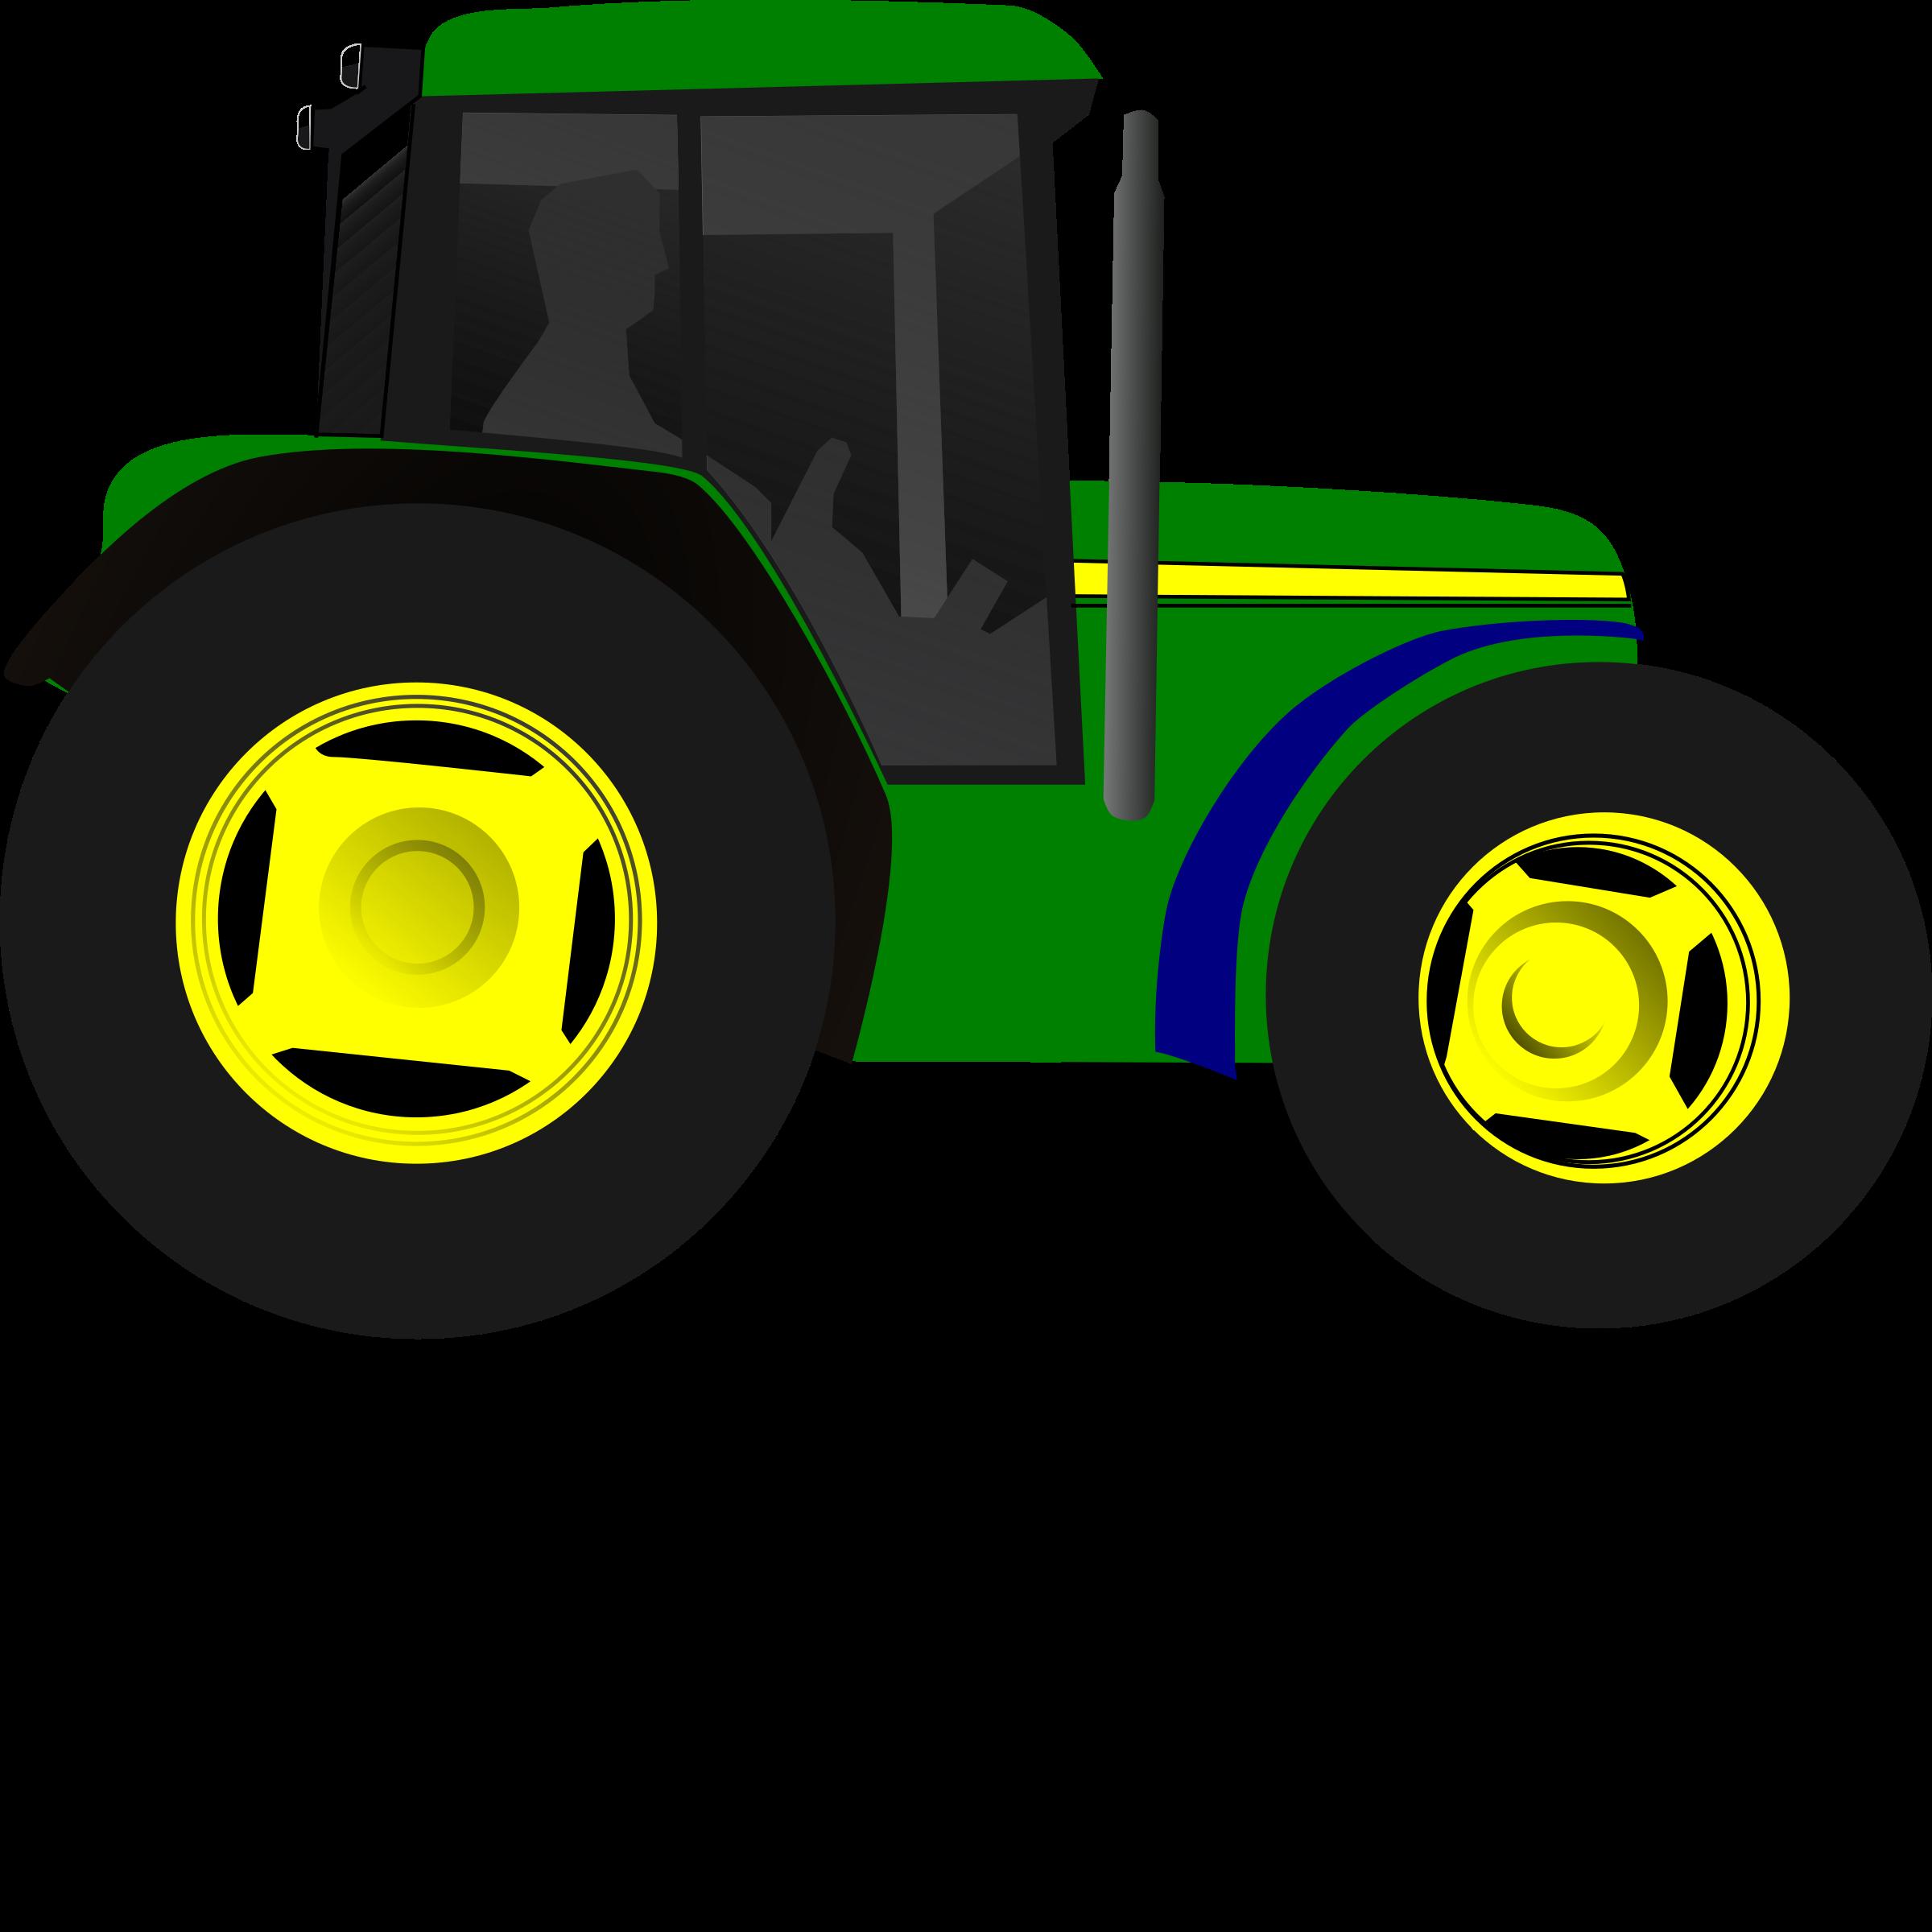 Tractor clipart little green #7